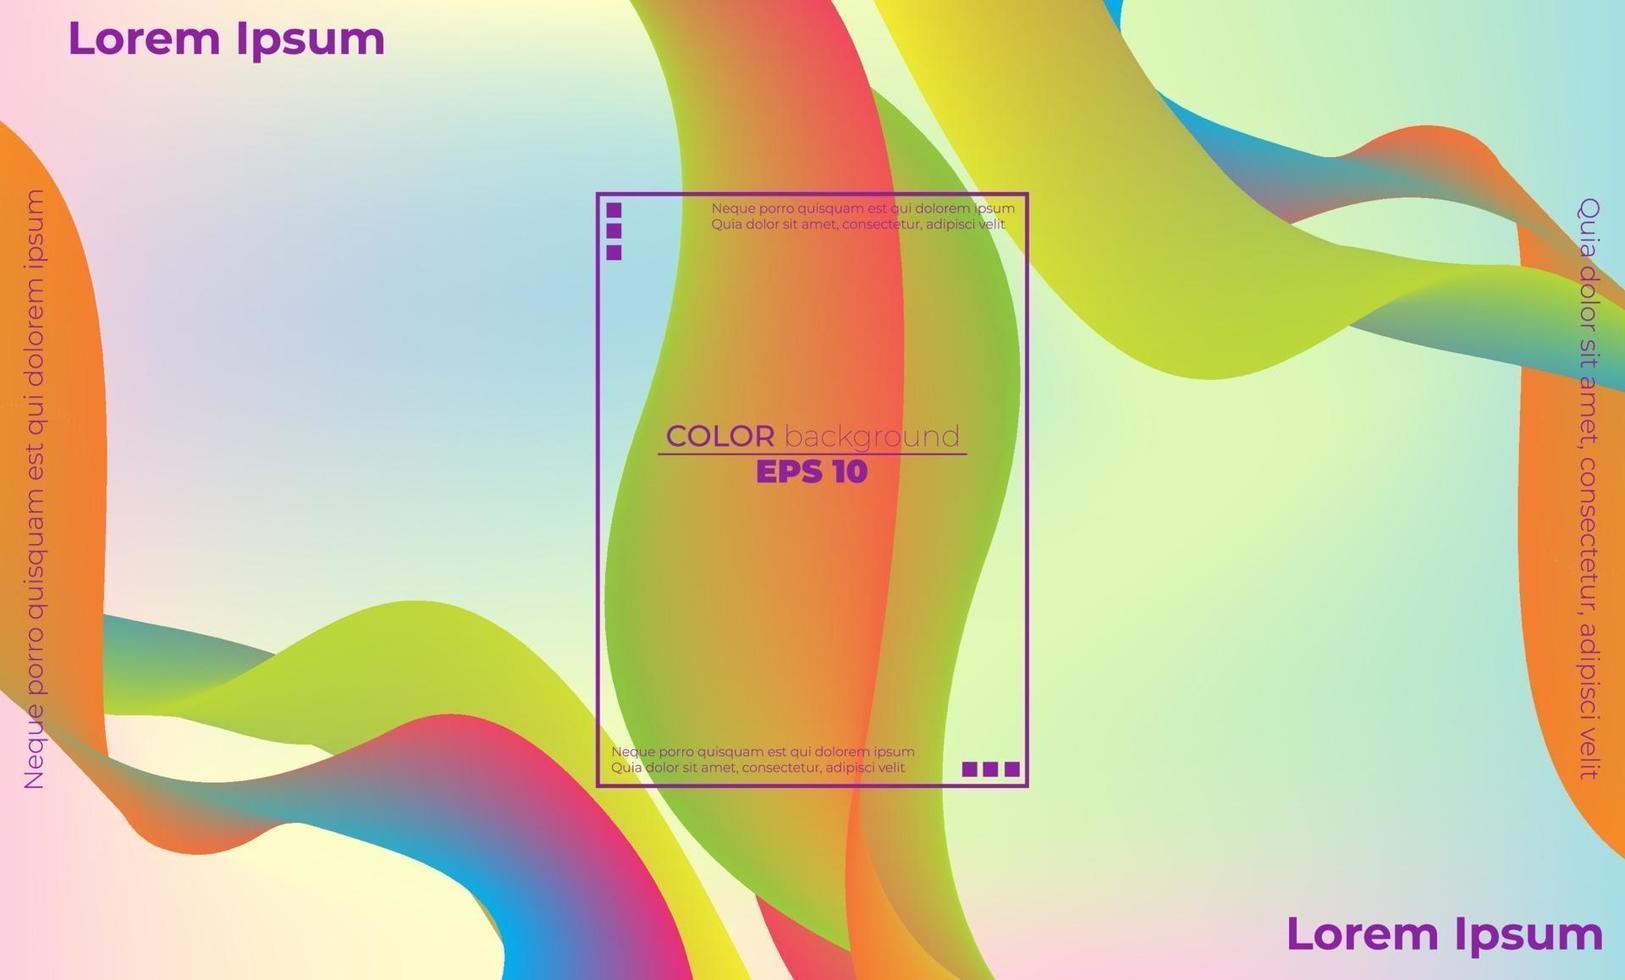 padrão de cor fluida abstrato de fundo gradiente líquido de cor neon vetor